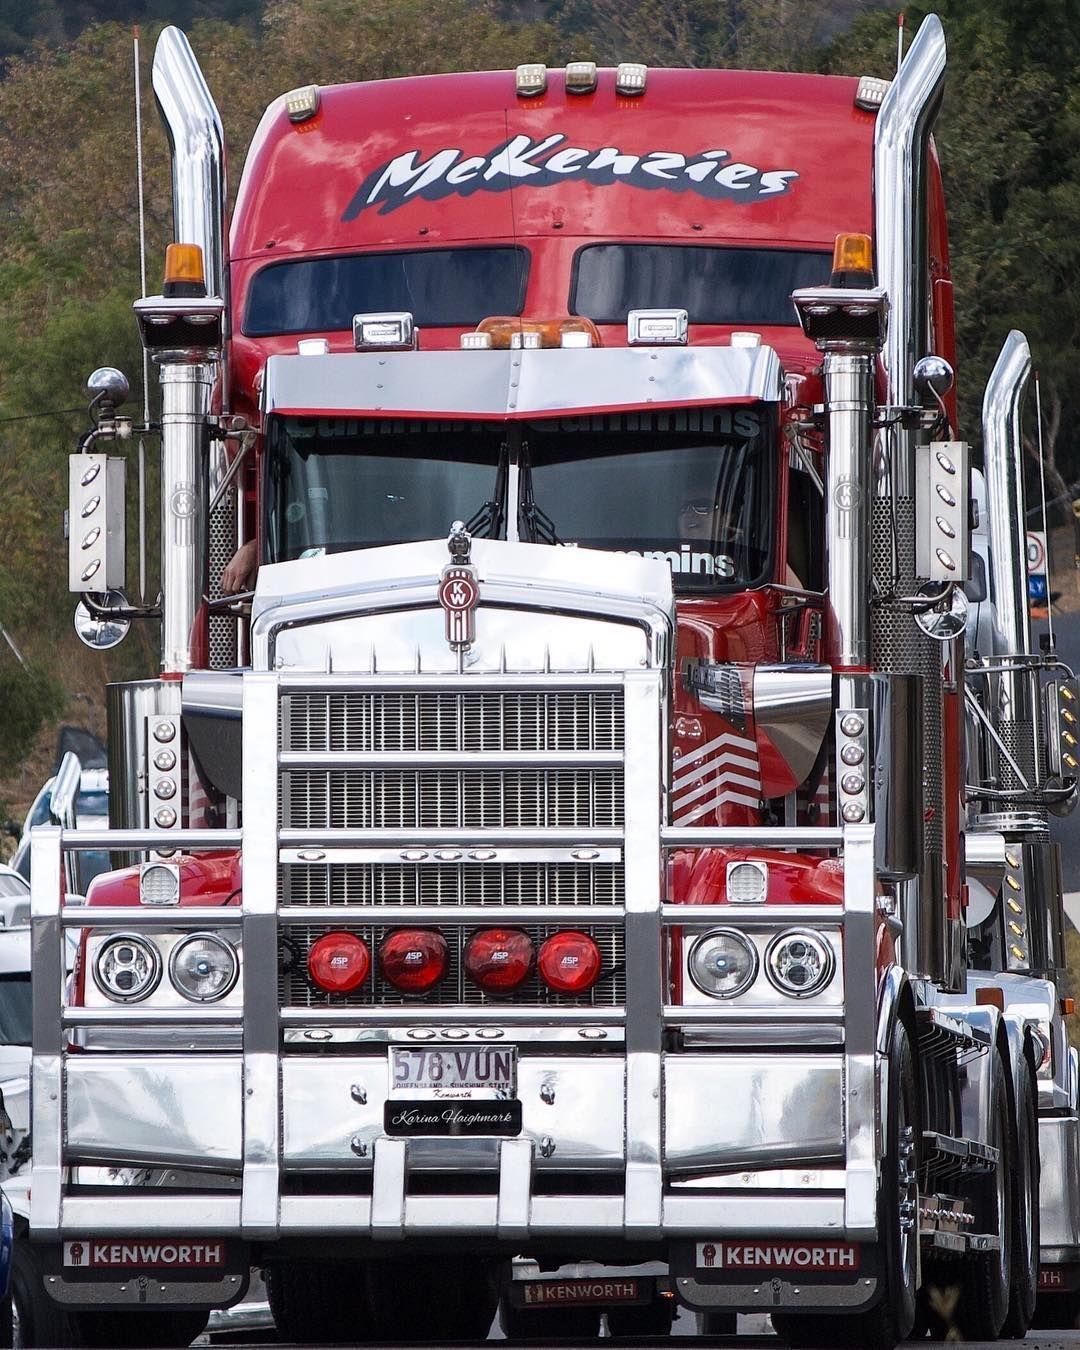 Mckenzies Kenworth Truck Kenworthtrucksaustralia Bigrig Red Gleaming Shine Kenworthtruck Truckphoto Custom Trucks Rat Rods Truck Custom Wheels Trucks